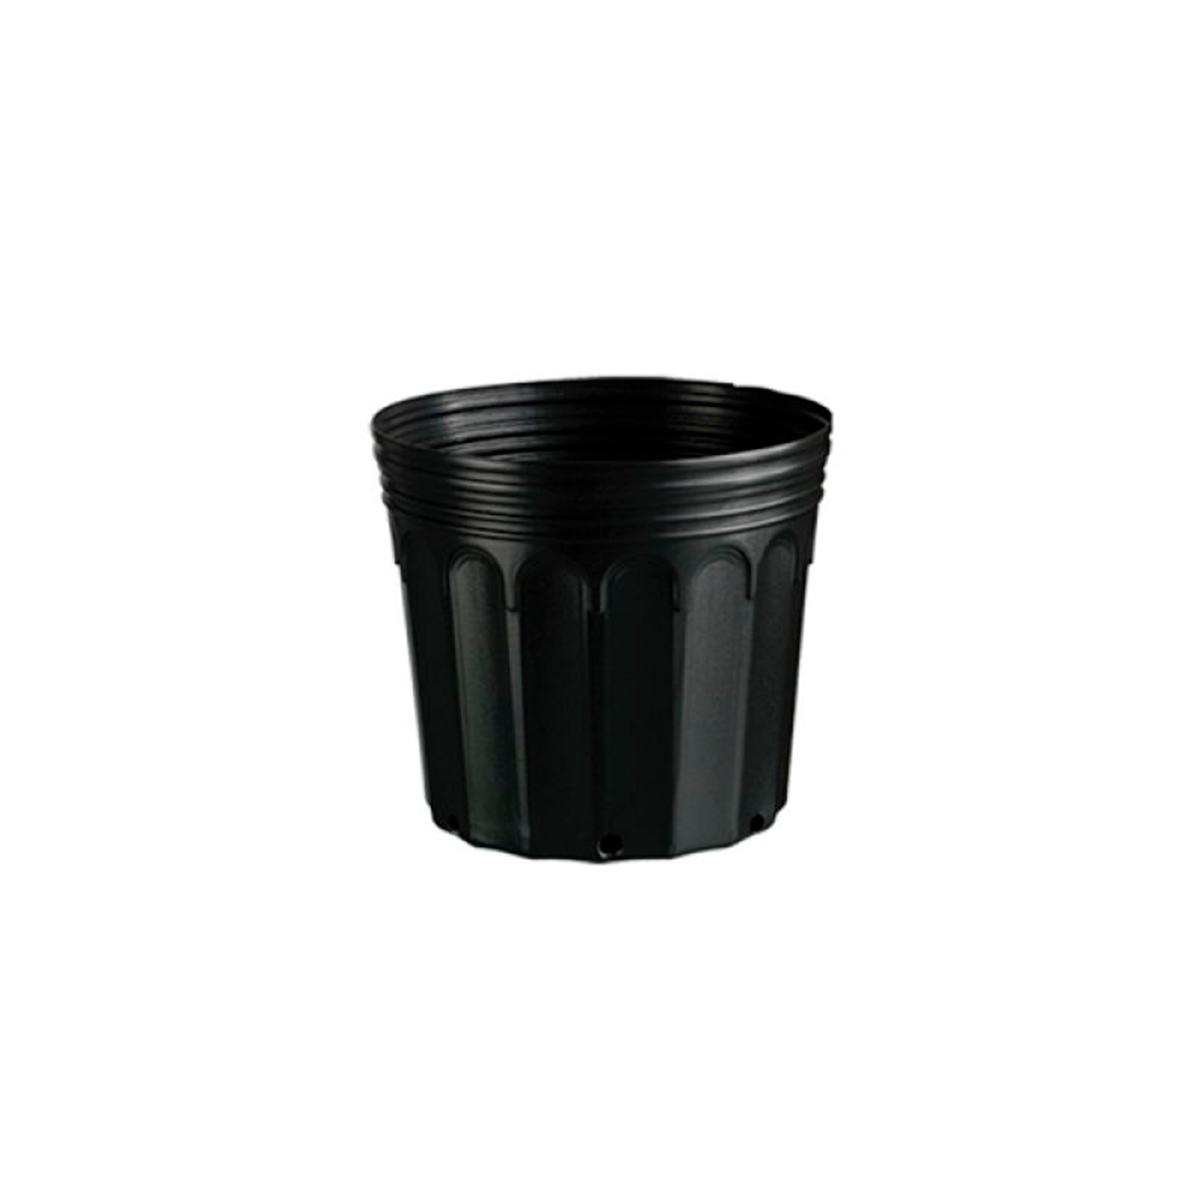 Kit 50 Embalagem para Mudas Flexível Plástico 8,5L